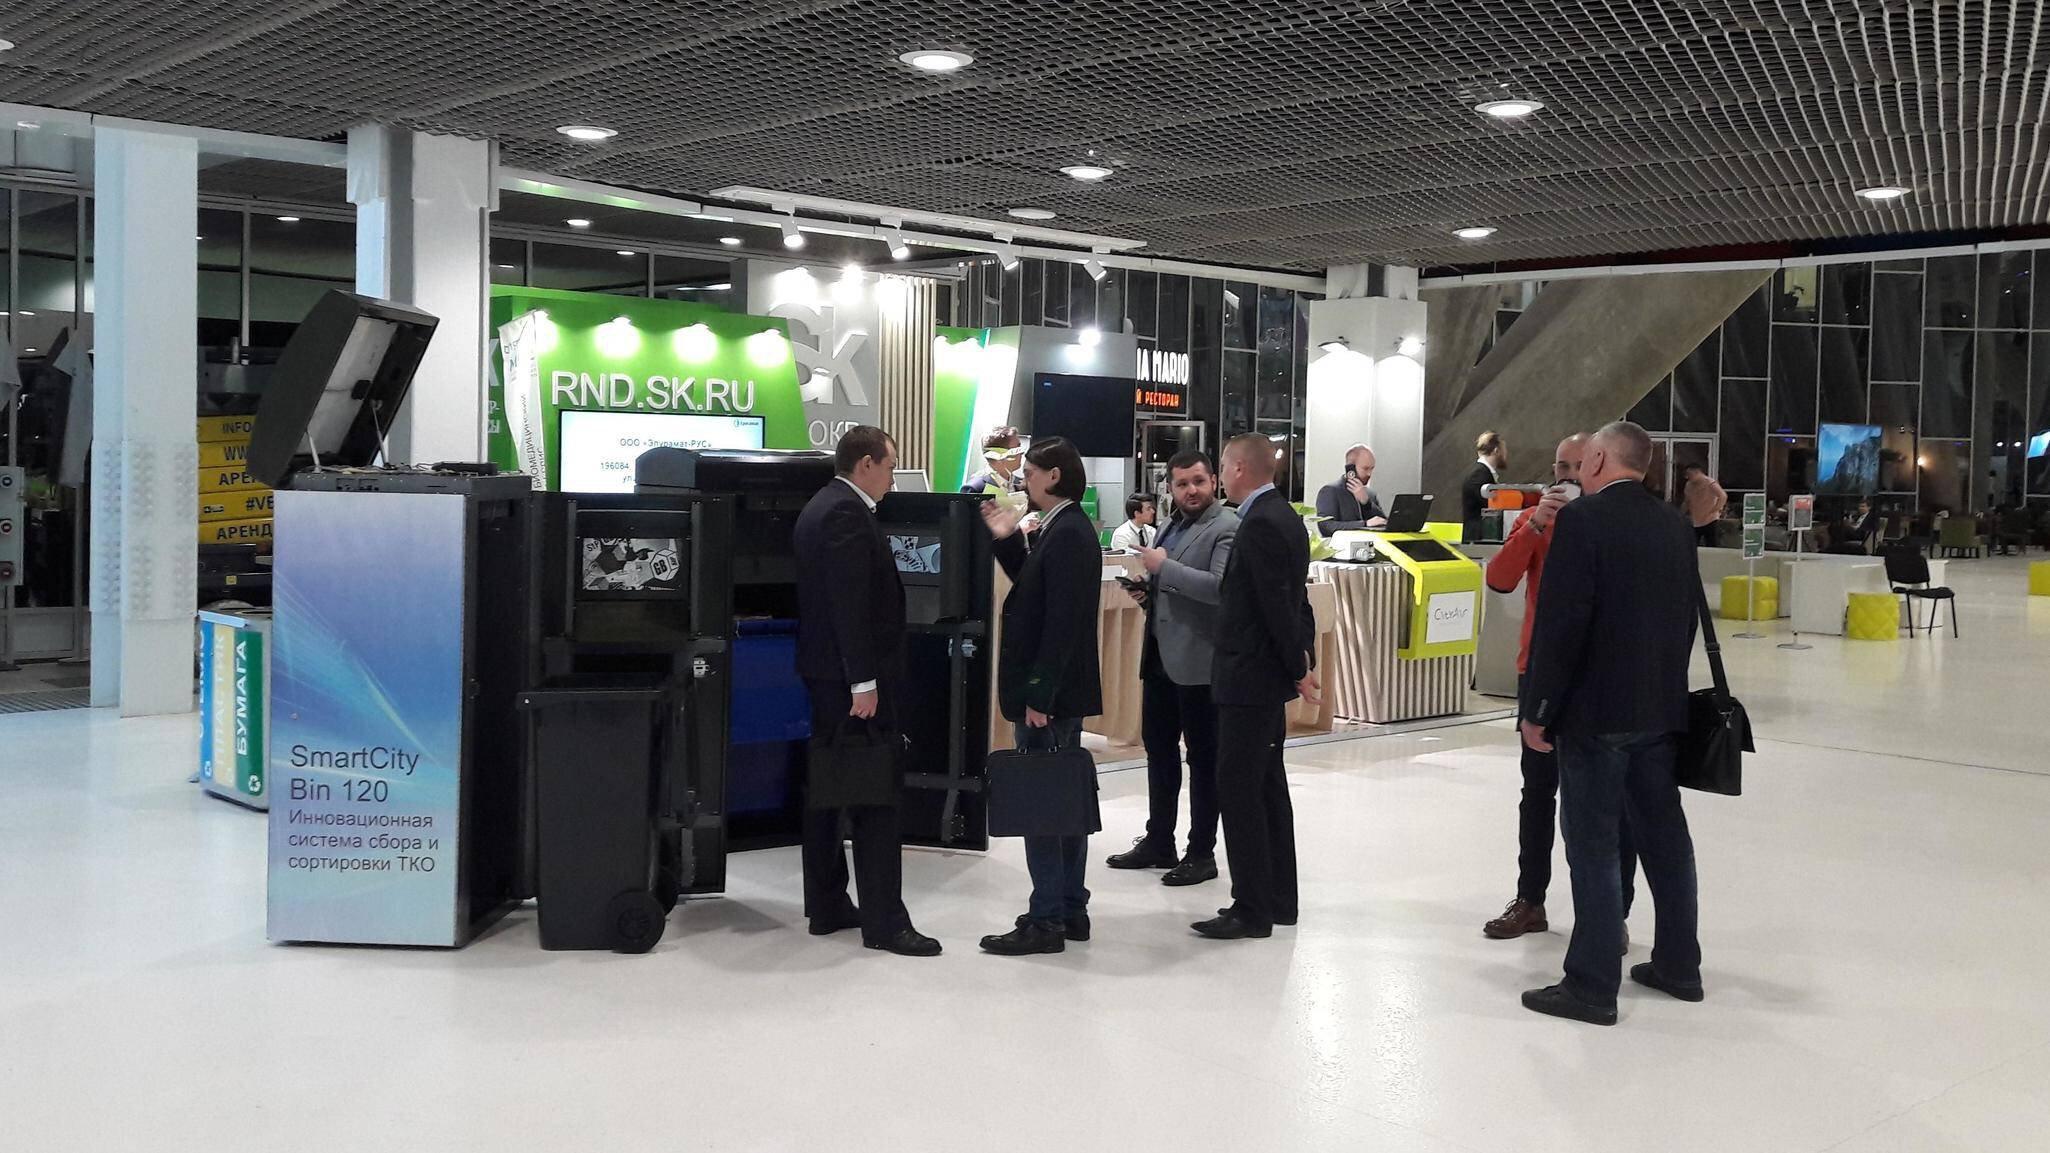 Gallery image 1 - SmartCity Bin 120 in Skolkovo 2019.